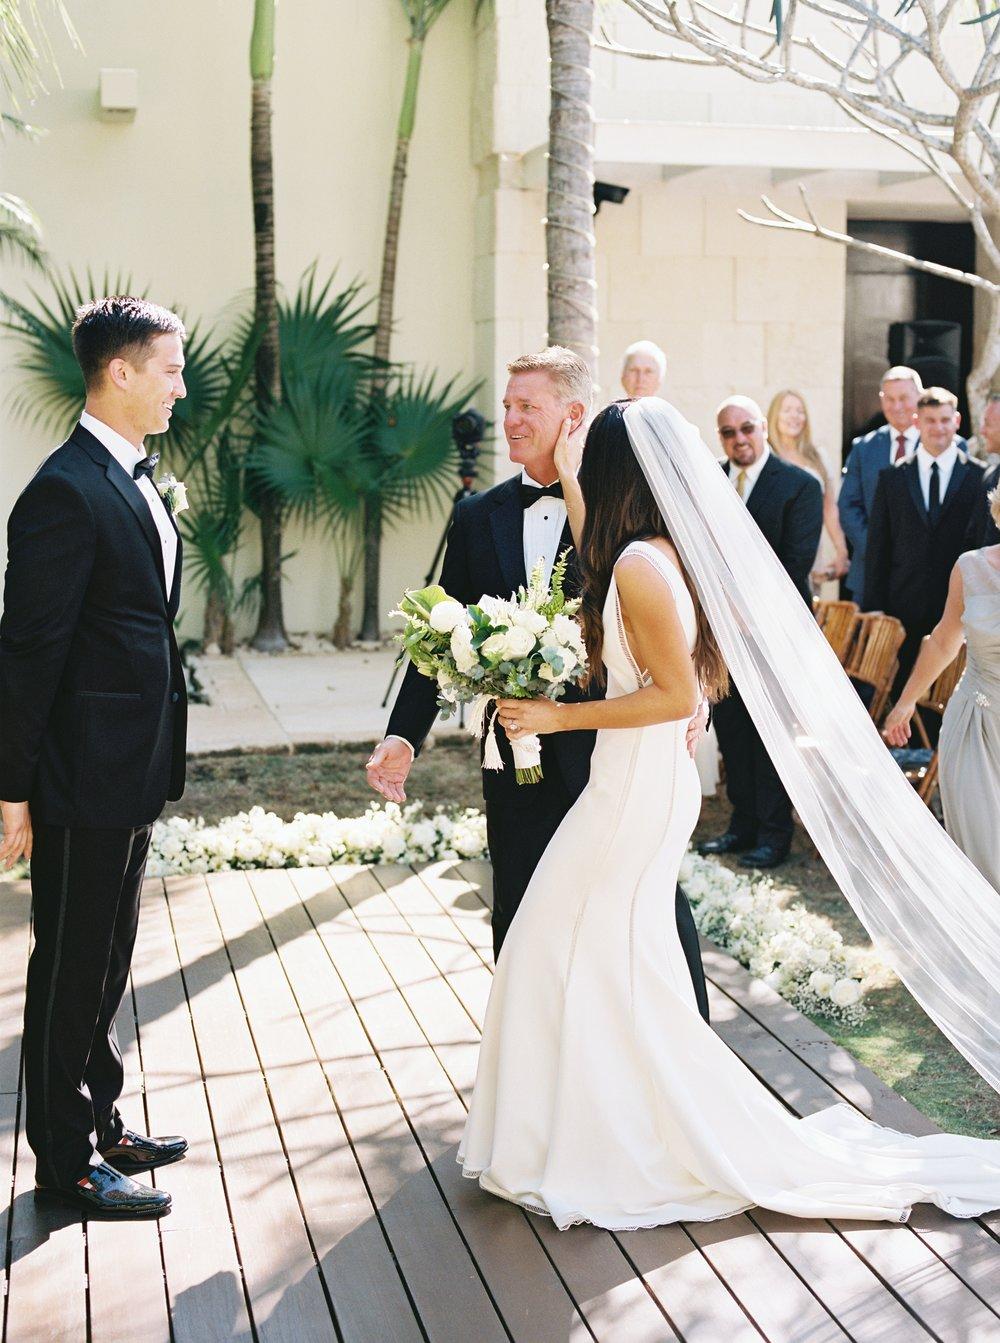 Kyle John l Fine Art Wedding Photography l Chicago, Copenhagen, California, New York, Destination l Blog l Brooke Boyd_The Film Poets_Tulum Wedding_15